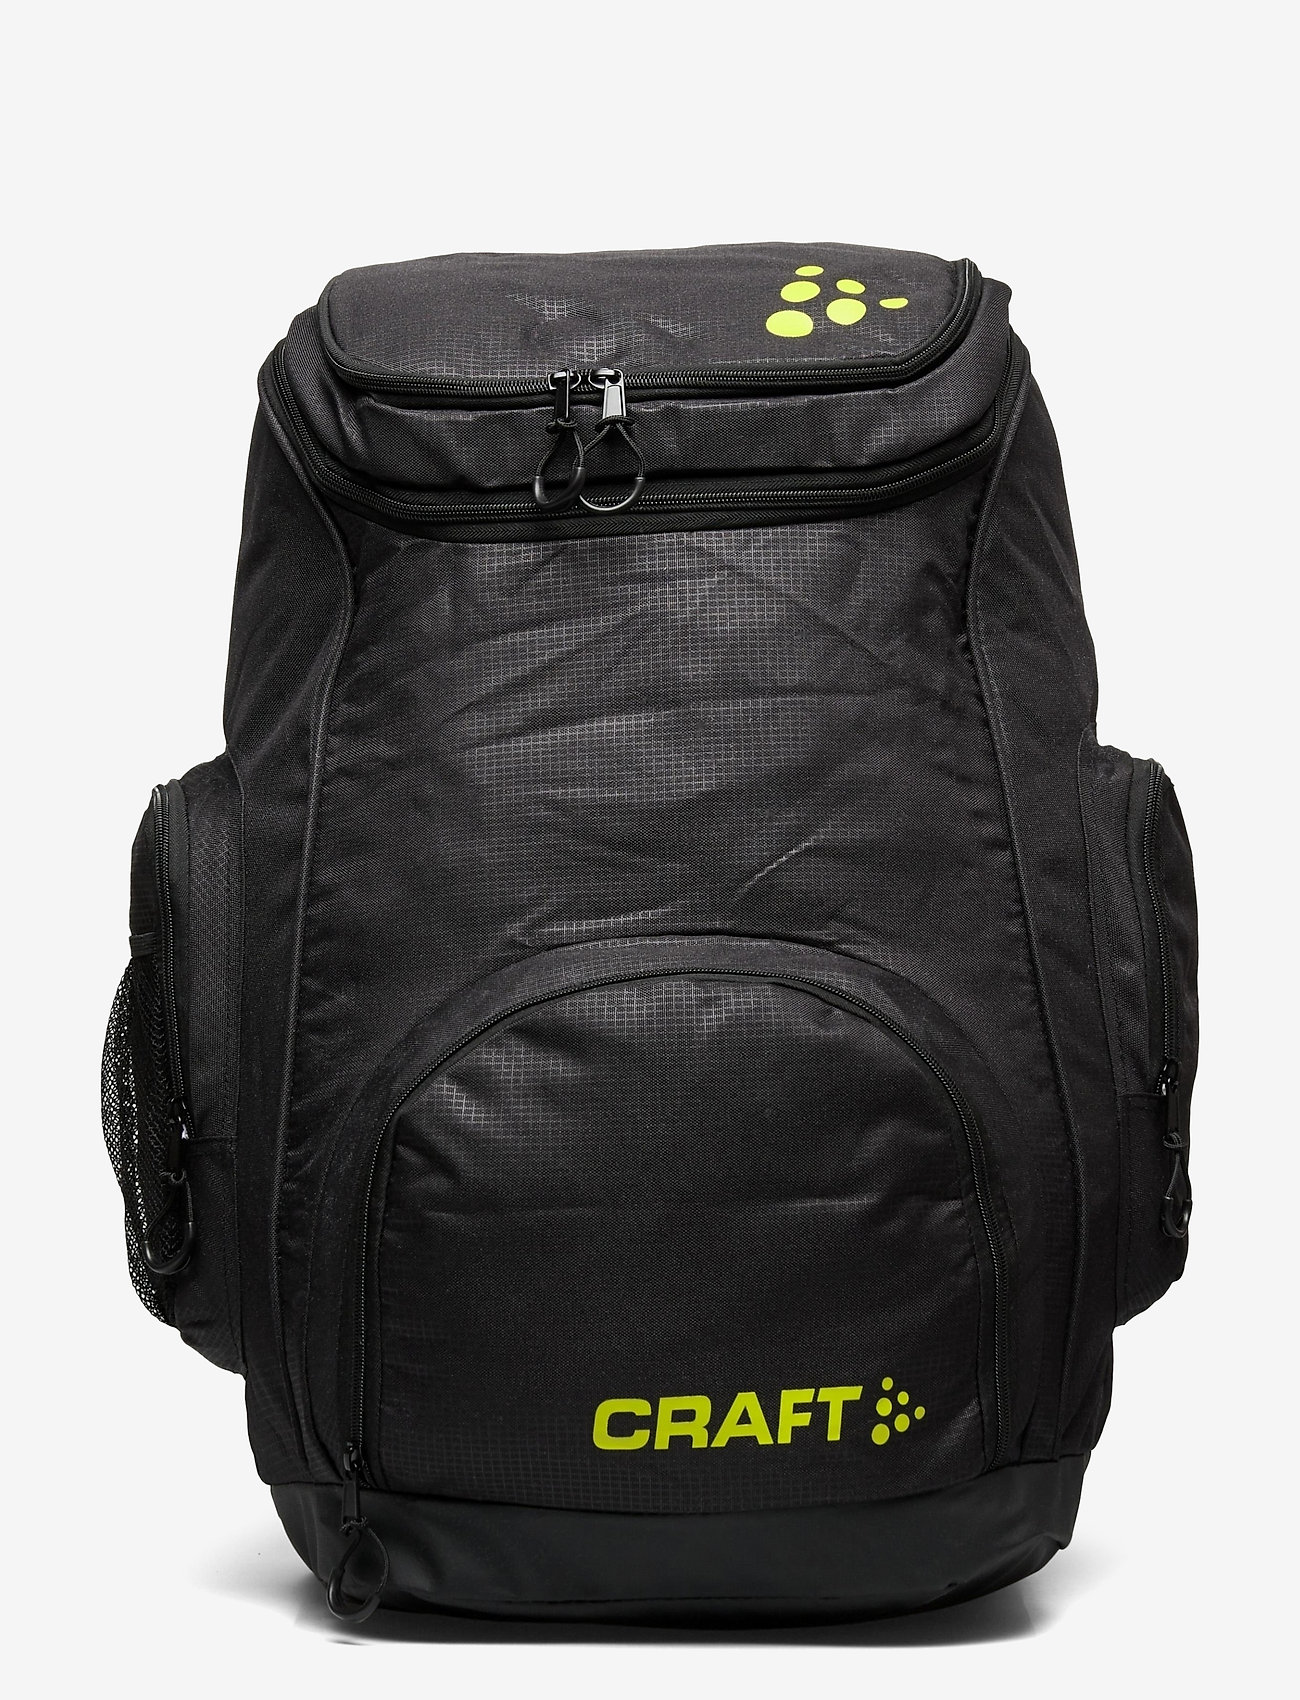 Craft - TRANSIT EQUIPMENT BAG 65 L - racketsporttassen - black - 0